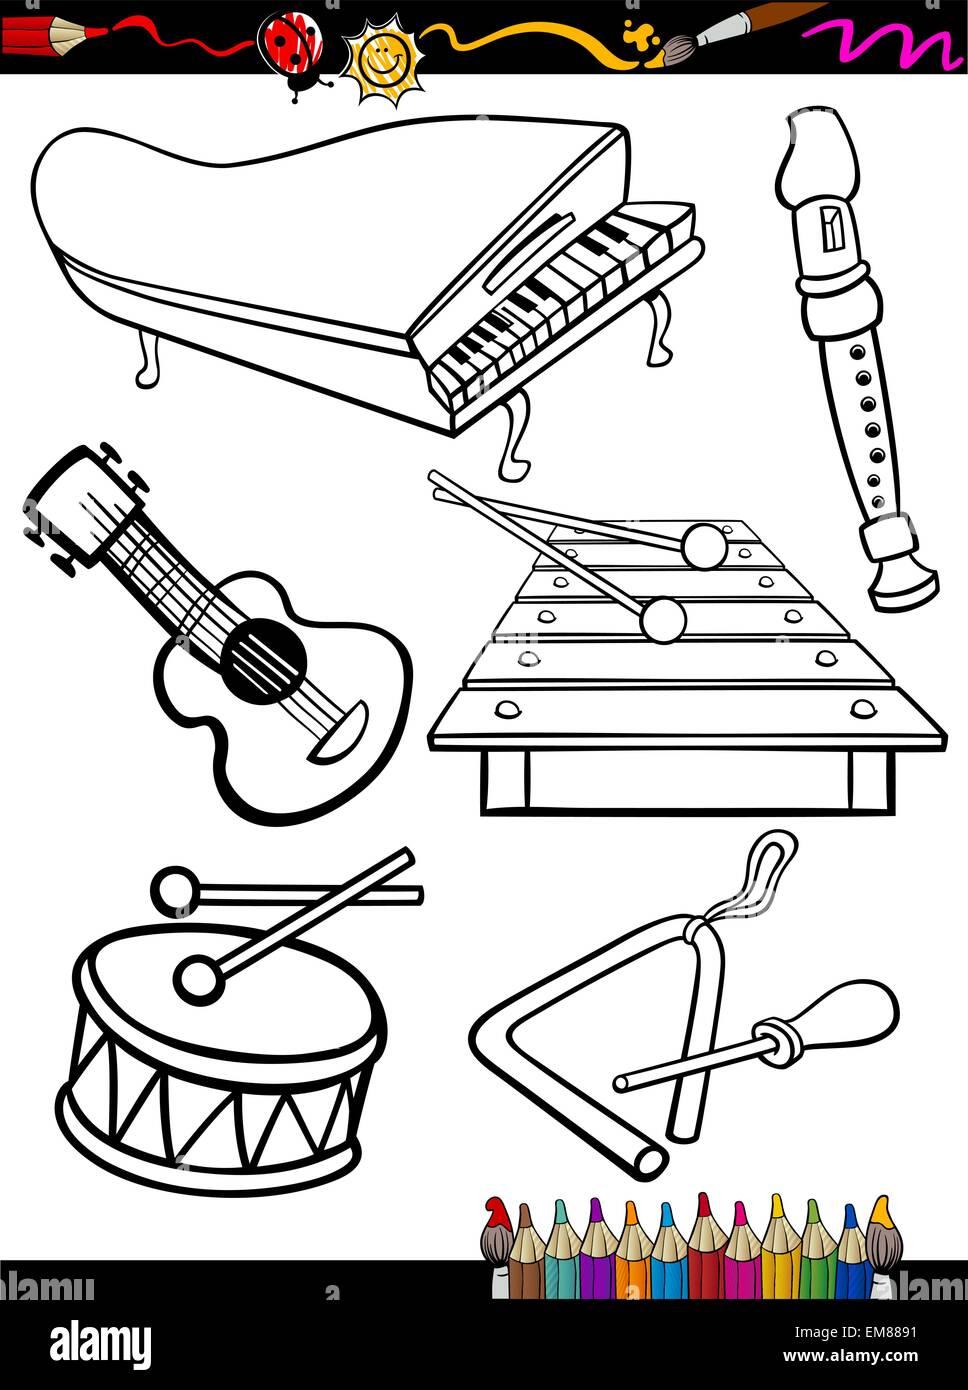 Cartoon Malvorlagen Musikinstrumente Vektor Abbildung - Bild ...